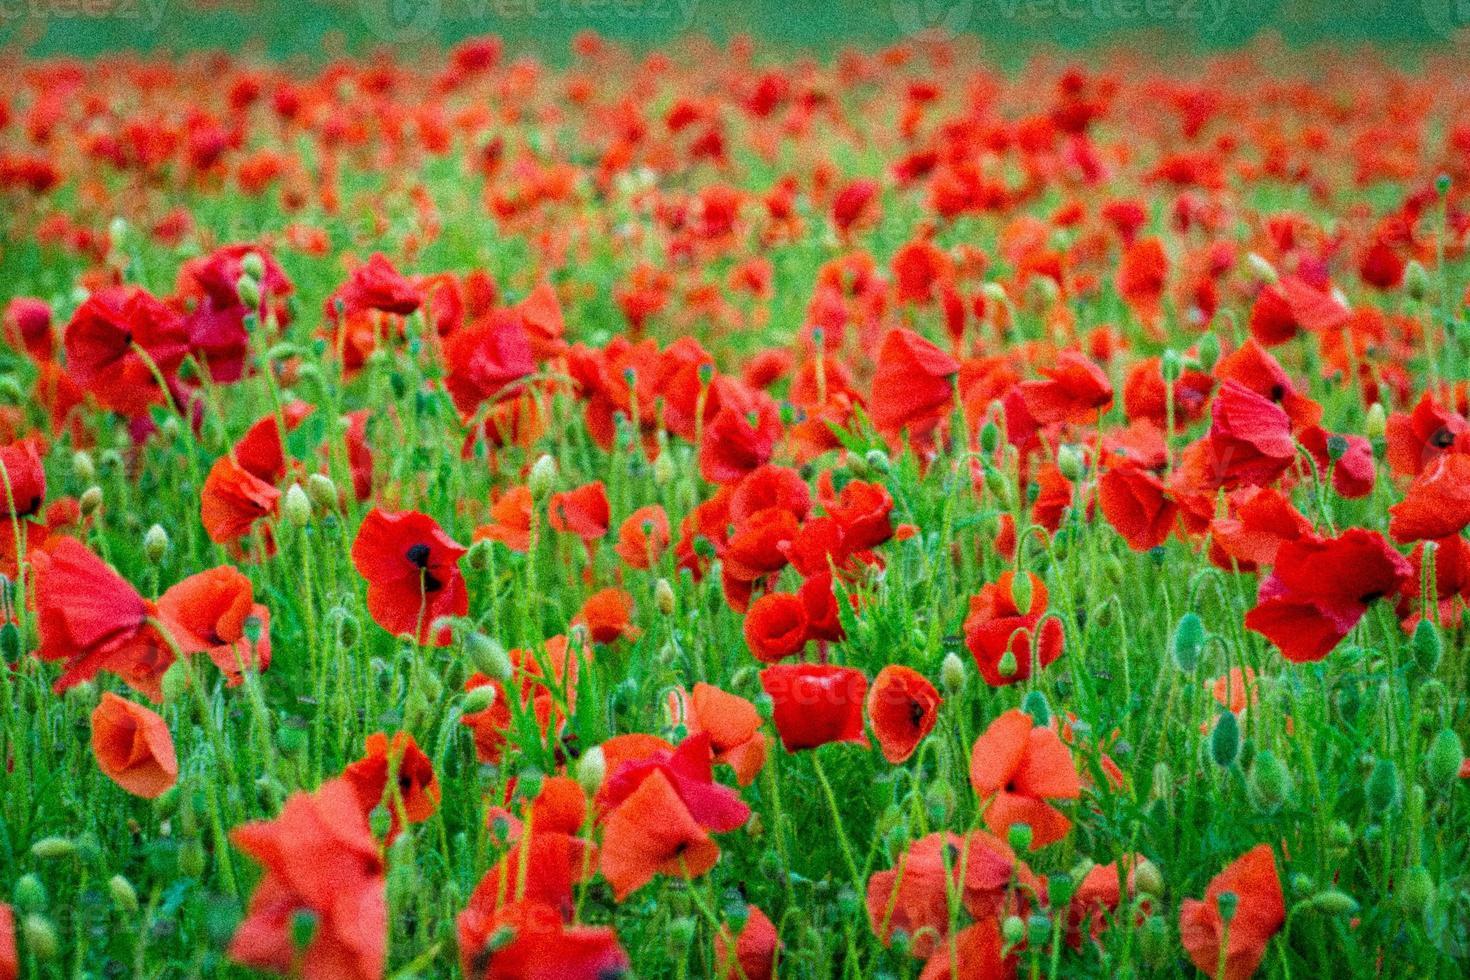 Poppy flowers photo